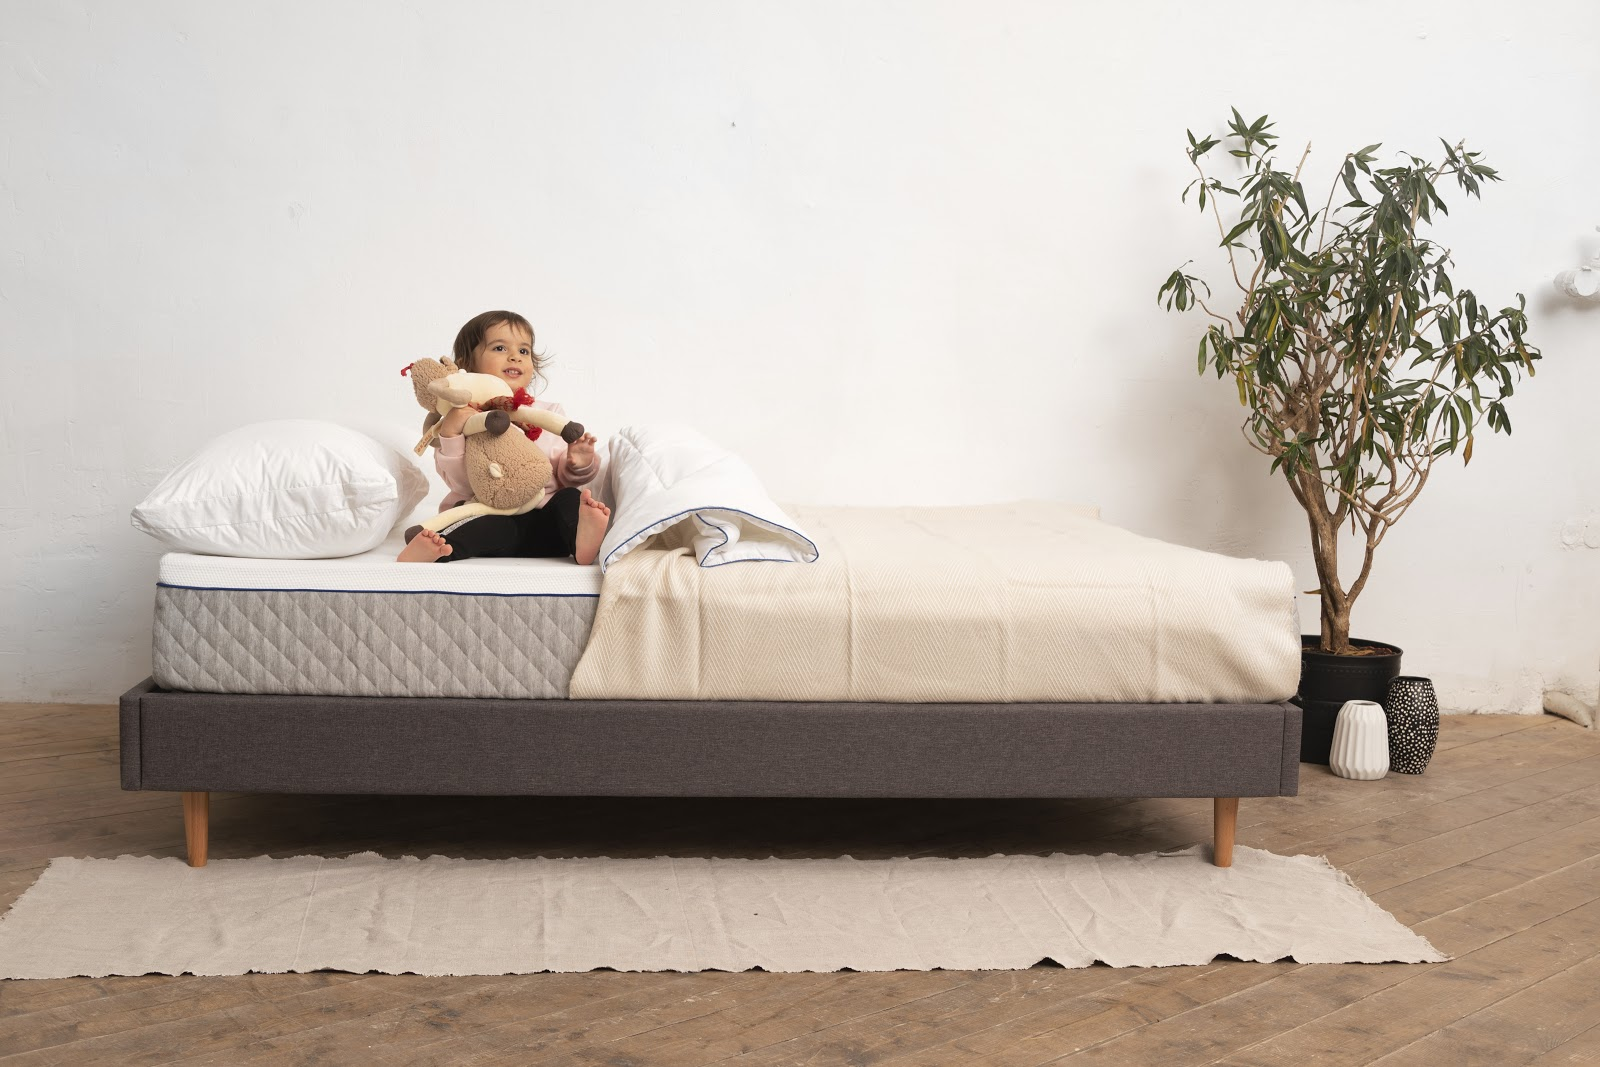 Ребенок на кровати Blue Sleep